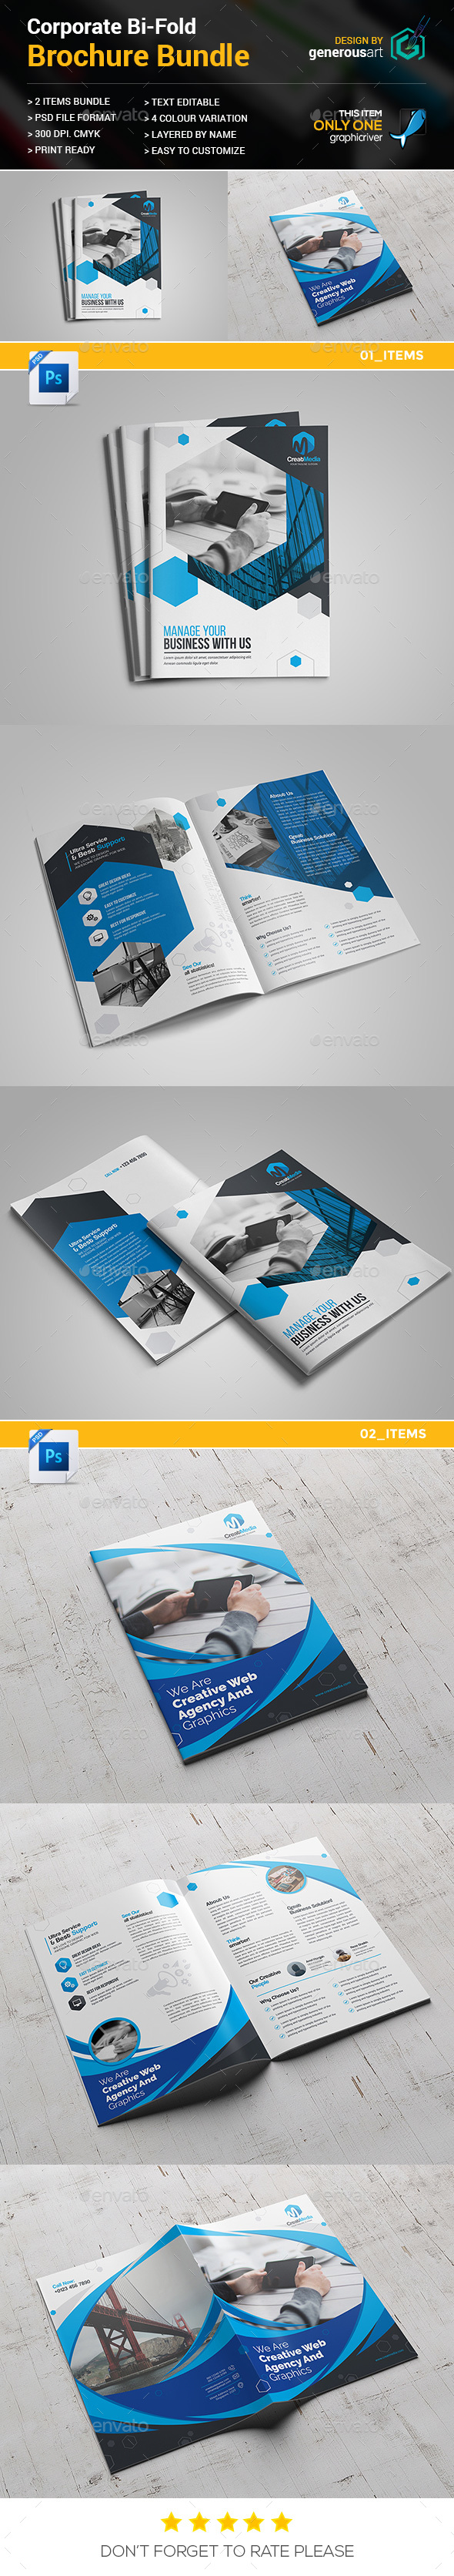 Business Bi-Fold Brochure Bundle 2 in 1 - Brochures Print Templates